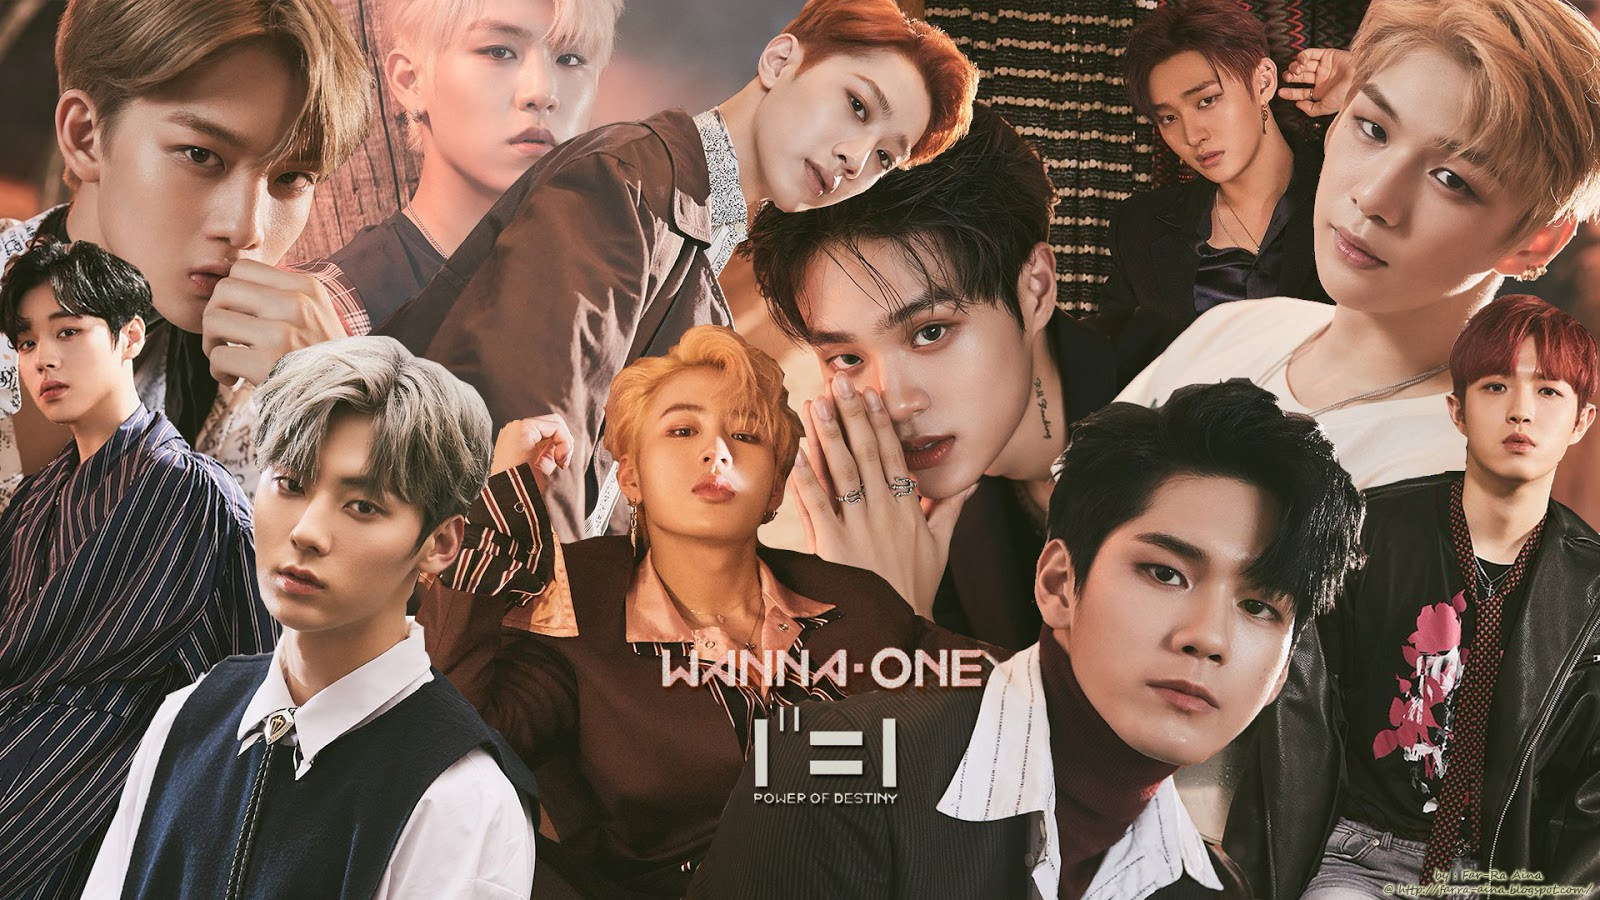 K Pop Lover Wanna One 1¹¹1 Power Of Destiny Wallpaper